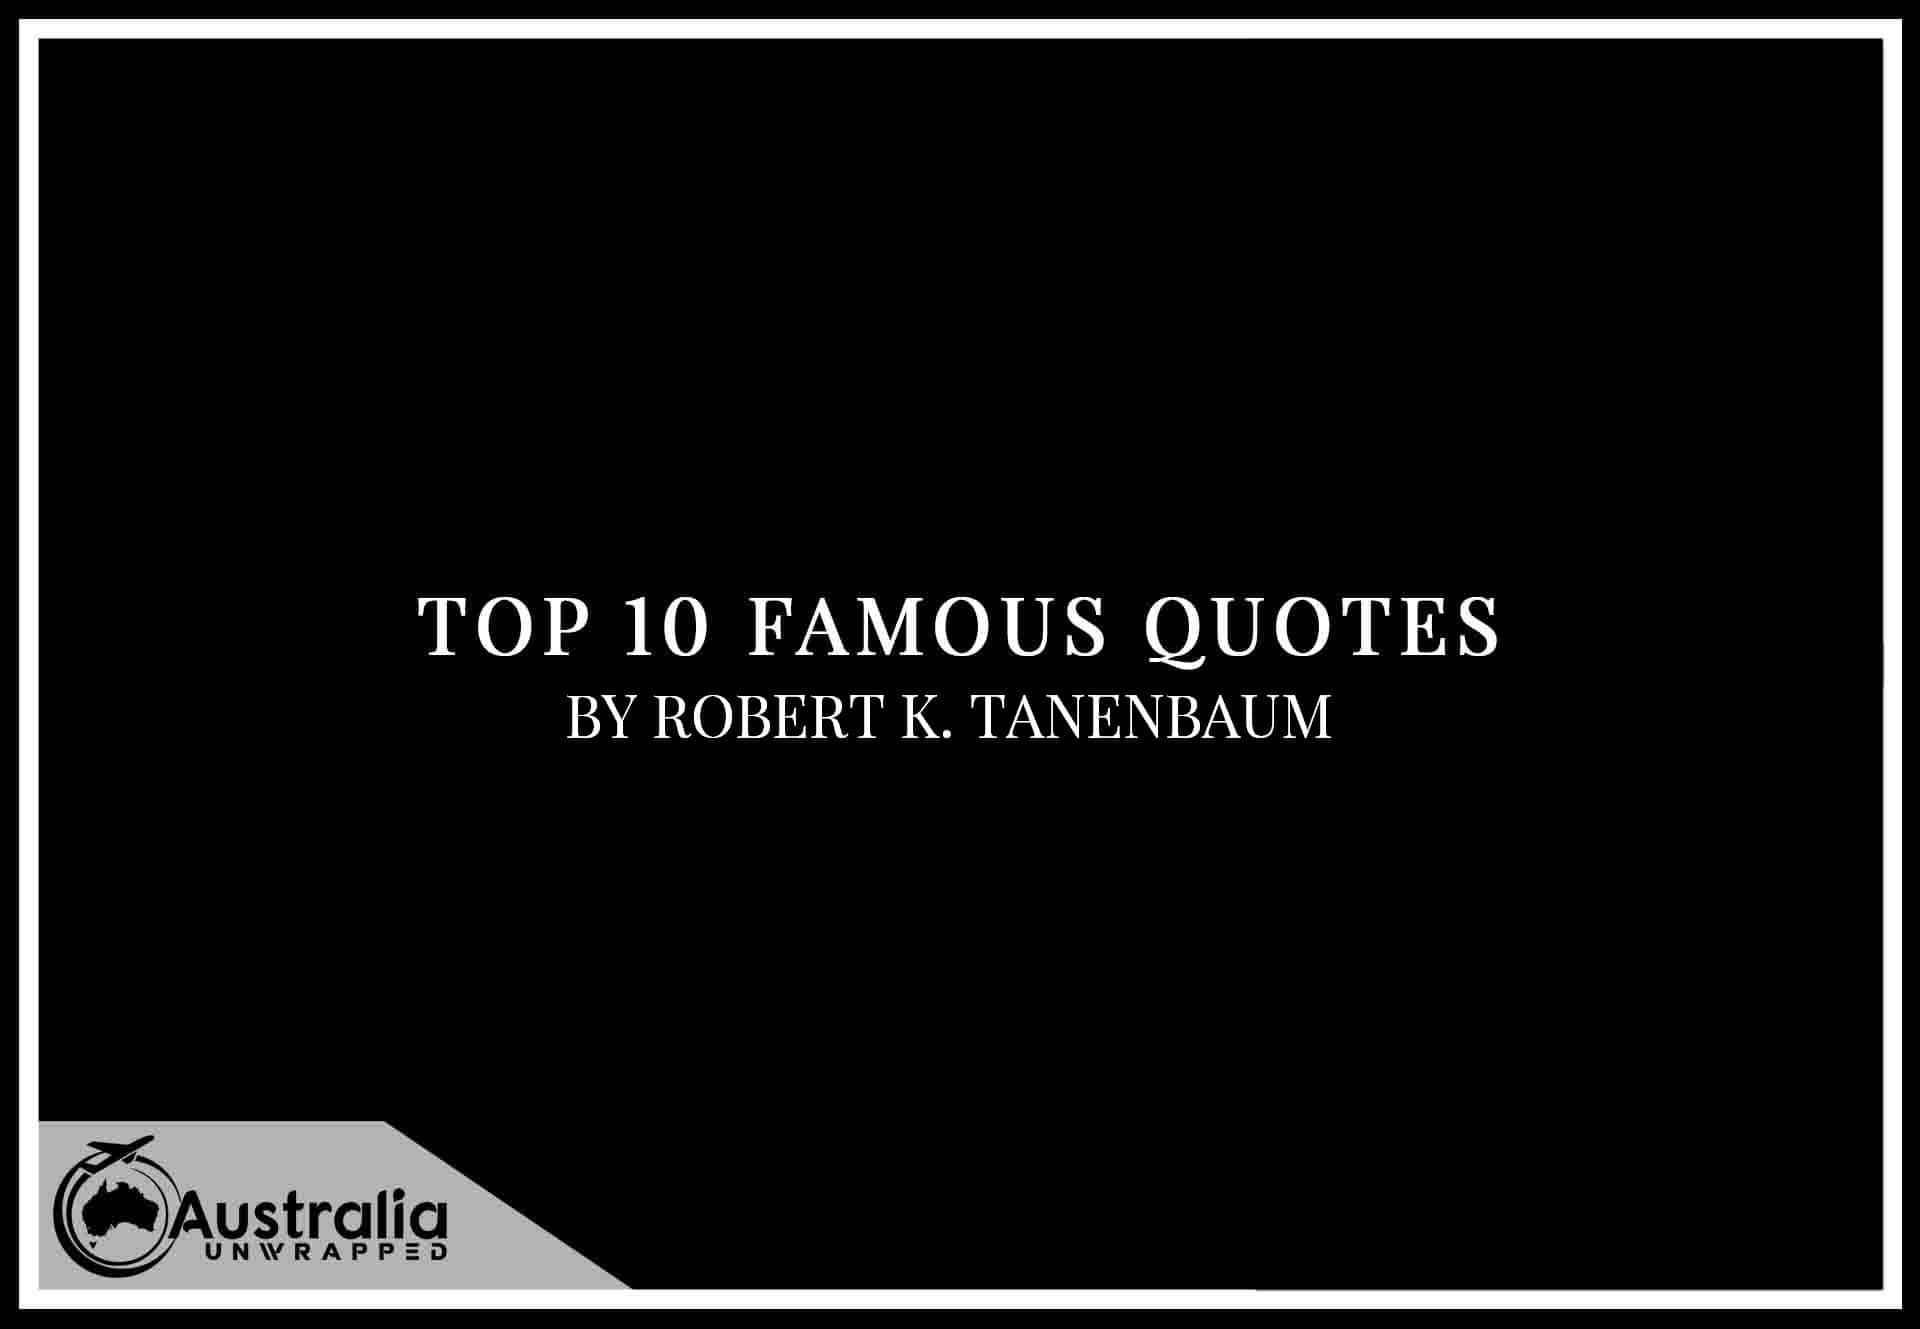 Top 10 Famous Quotes by Author Robert K. Tanenbaum